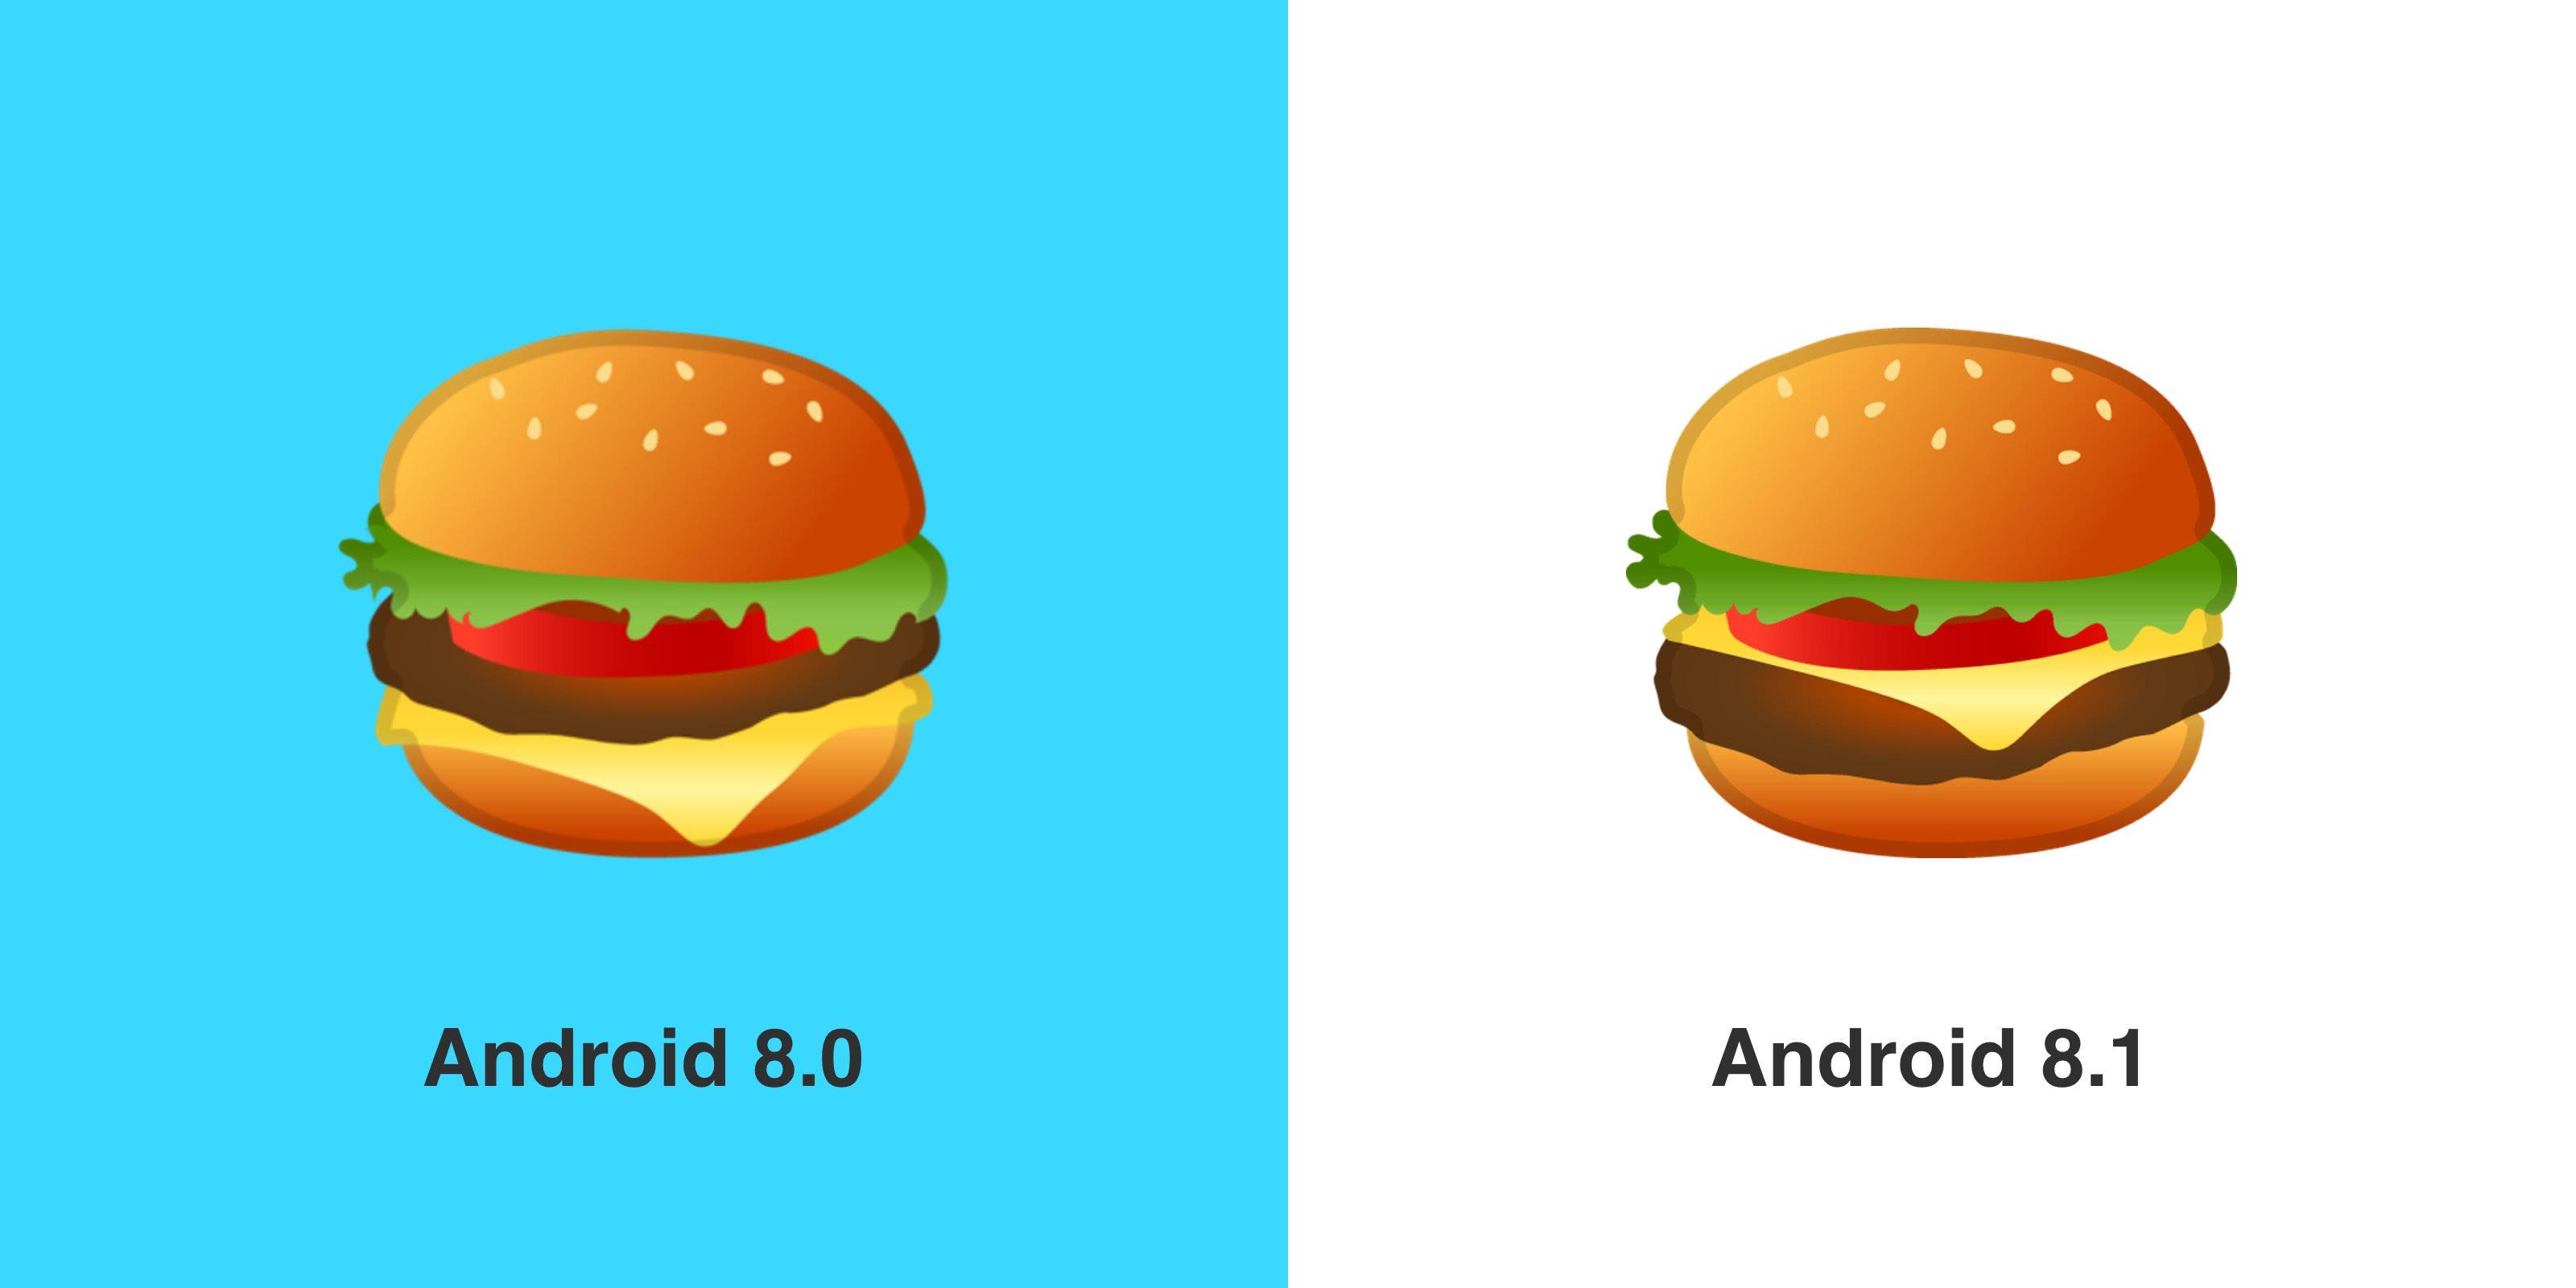 "alt=""Android 8.1 Burger"""